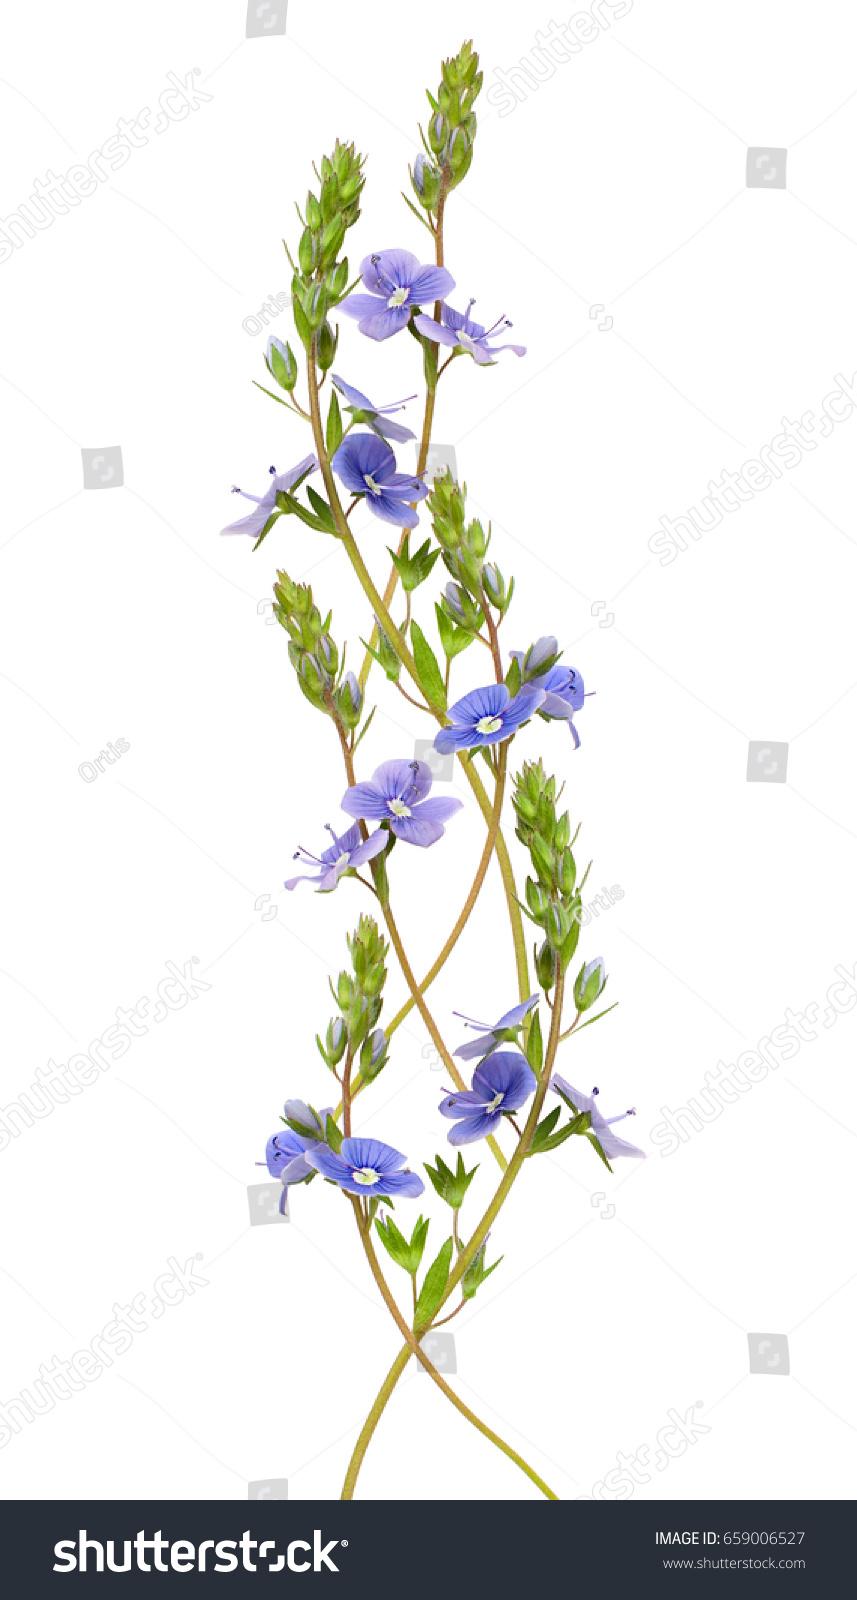 Veronica Foloformis Flowers Wave Arrangement Isolated On White